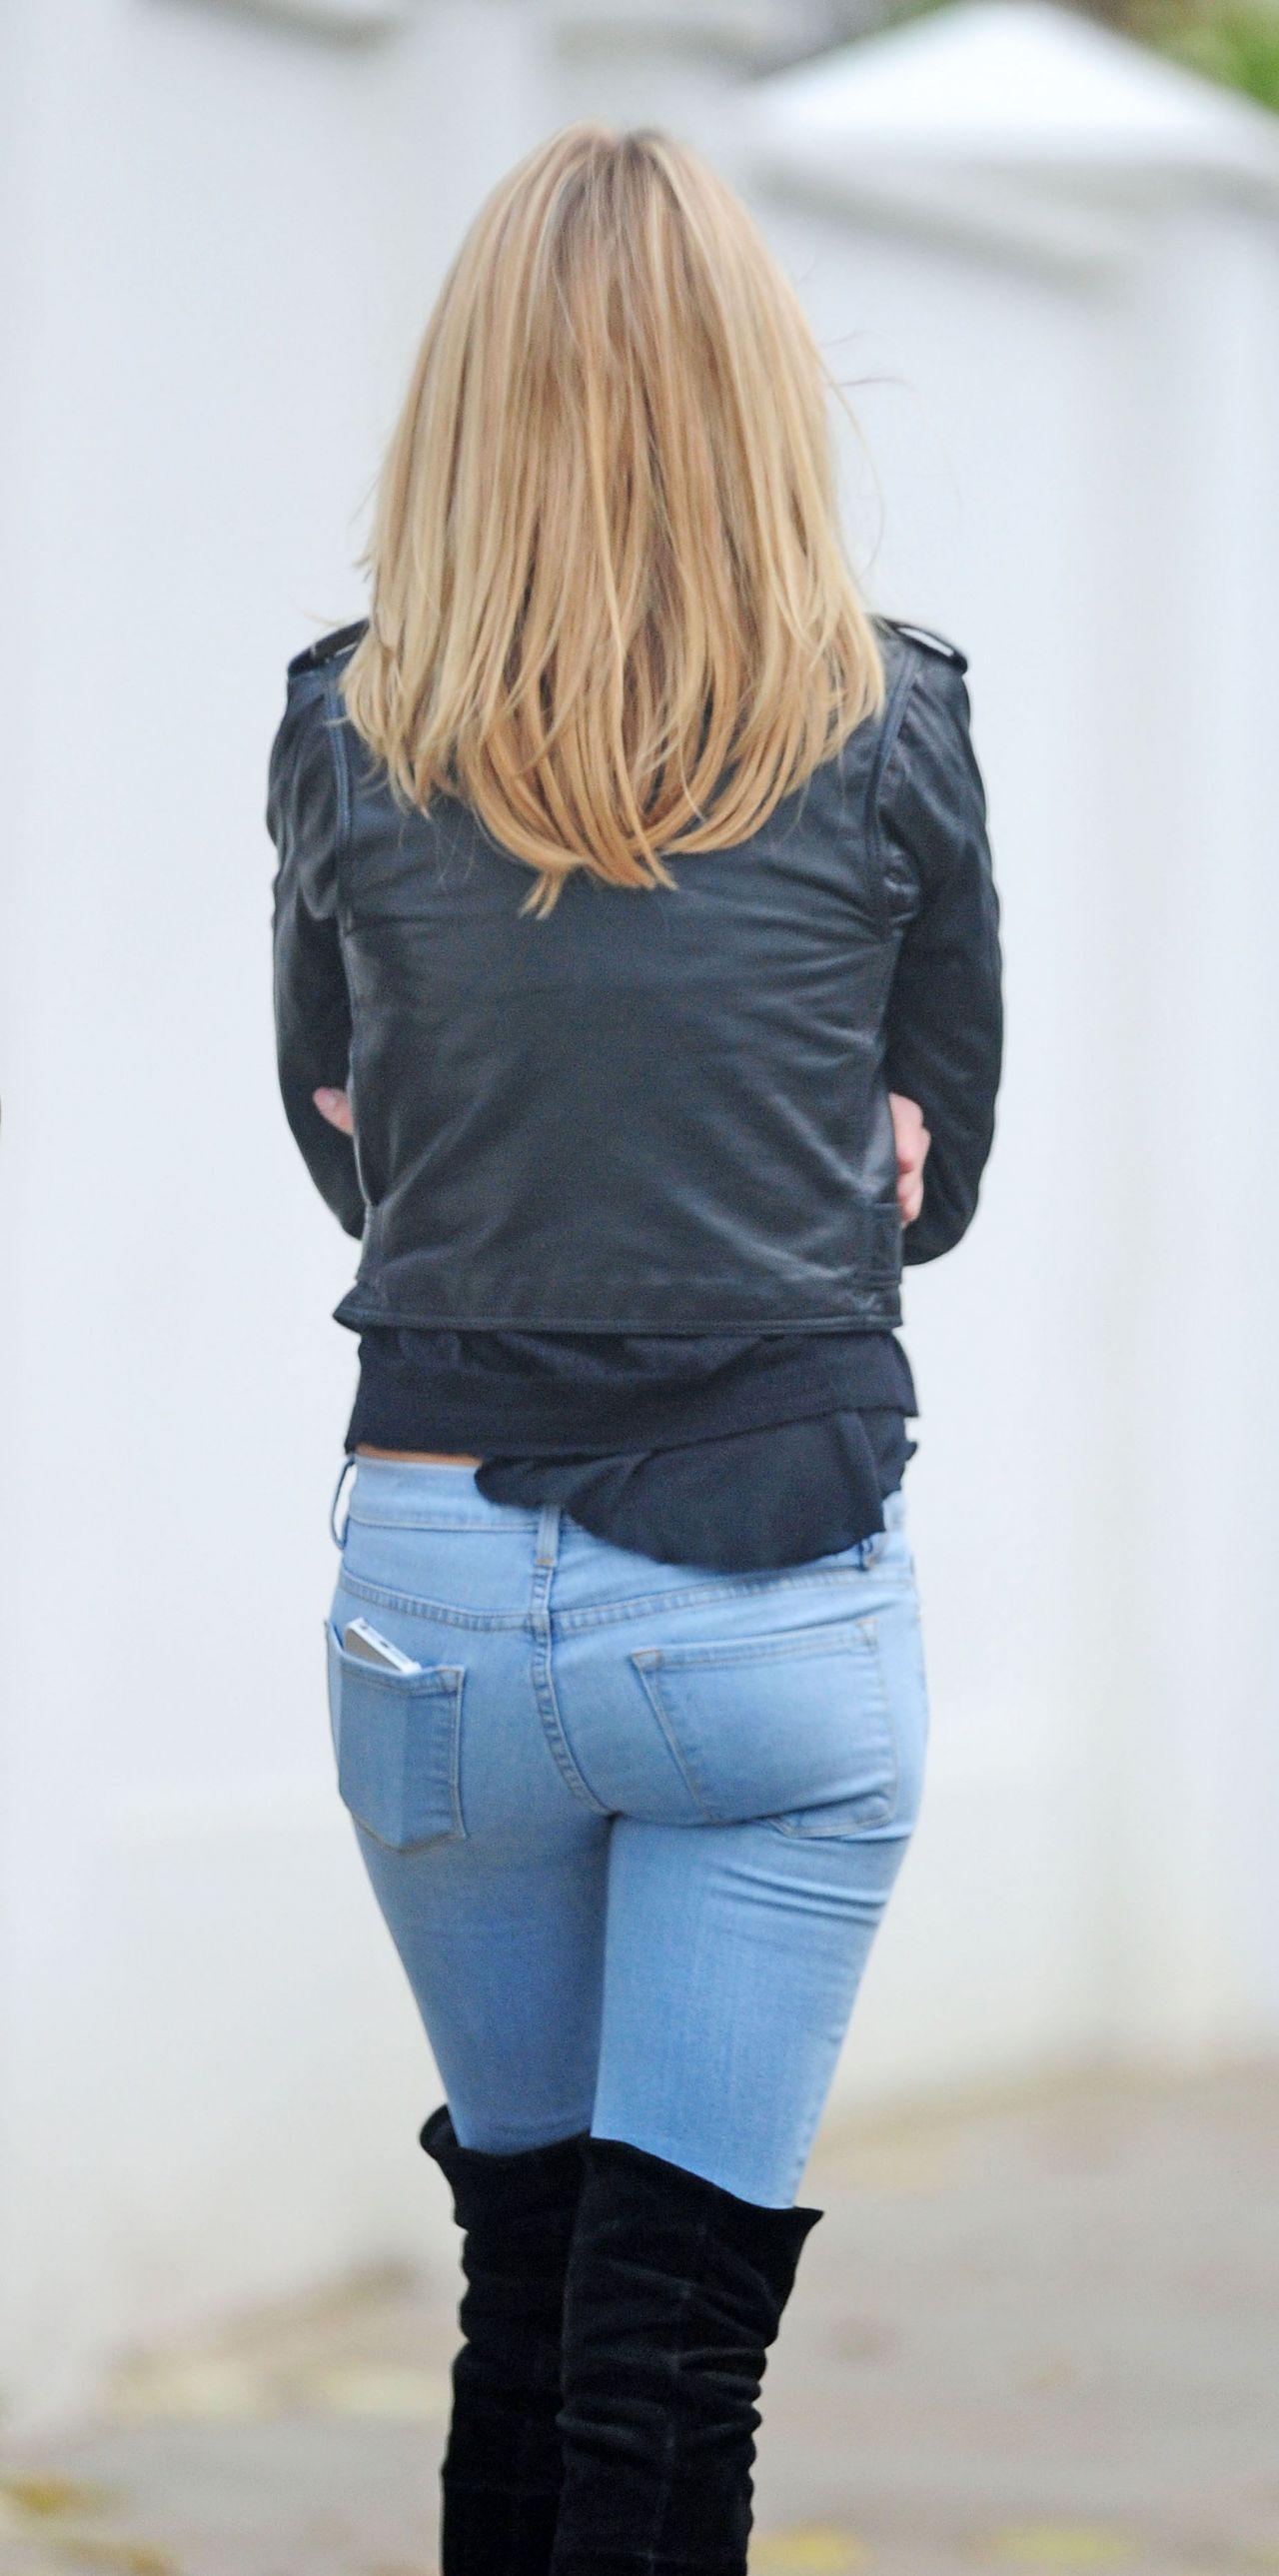 Kimberley Garner Street Style In Jeans Out In London